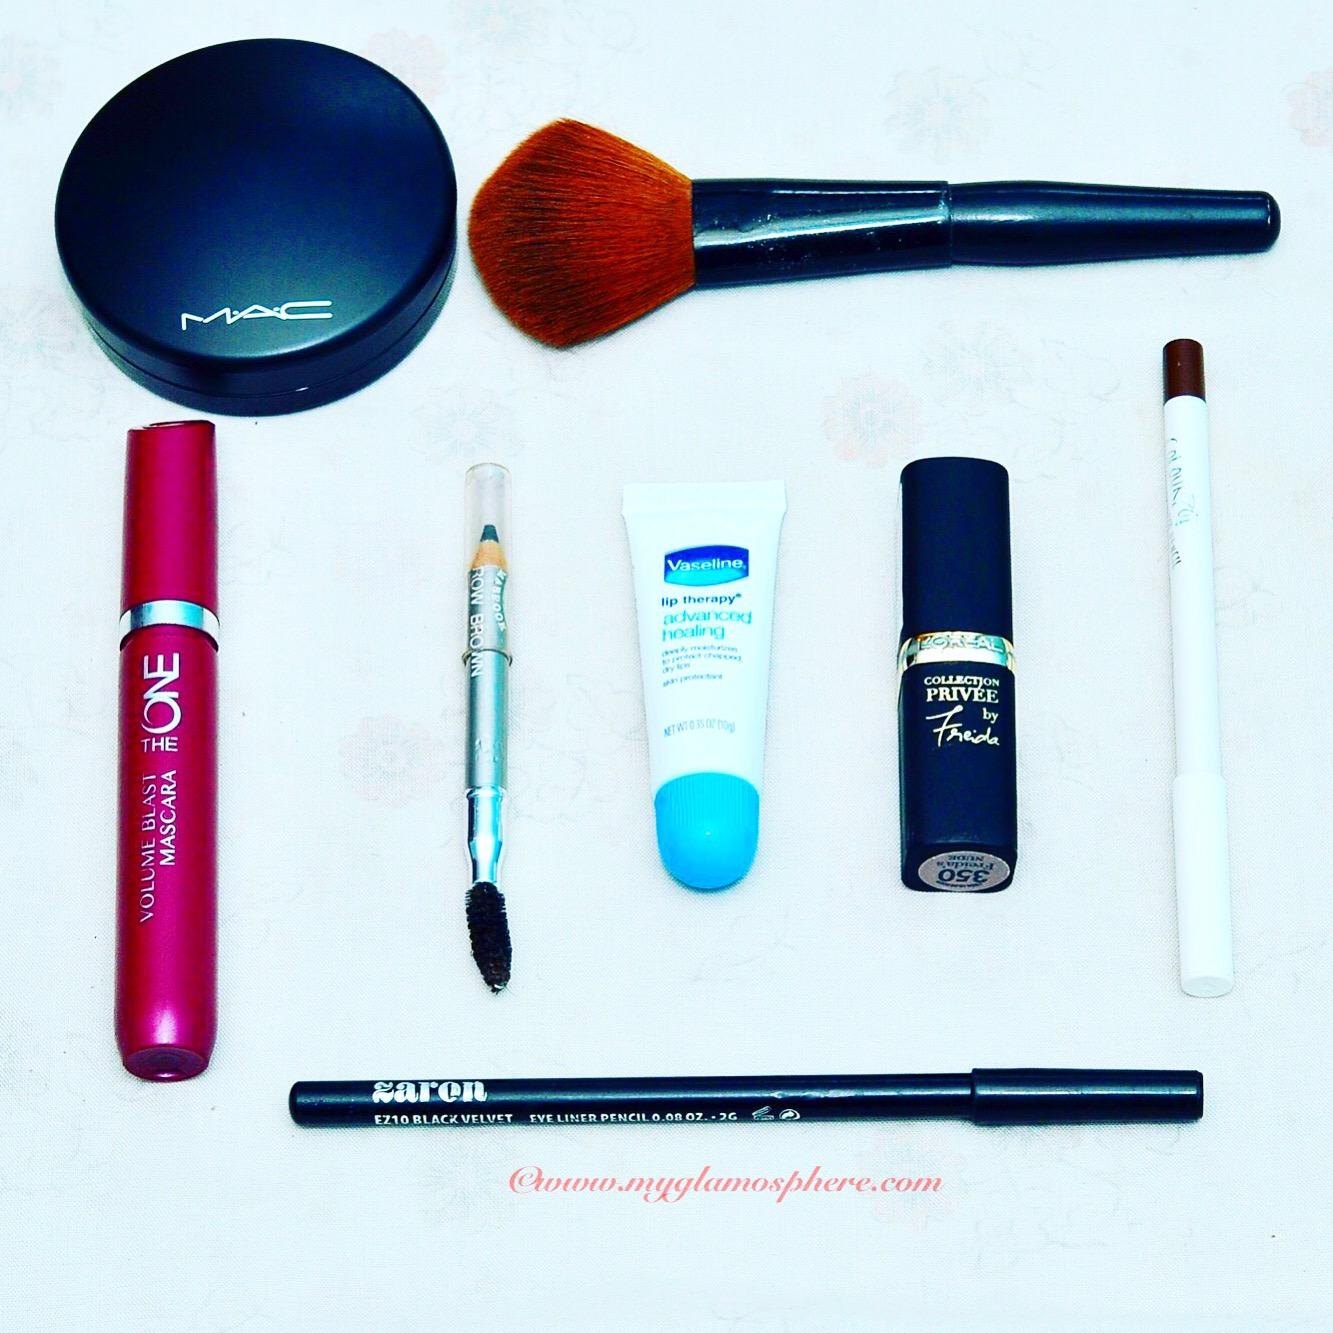 Everyday Makeup Routine For Oily Skin | Saubhaya Makeup